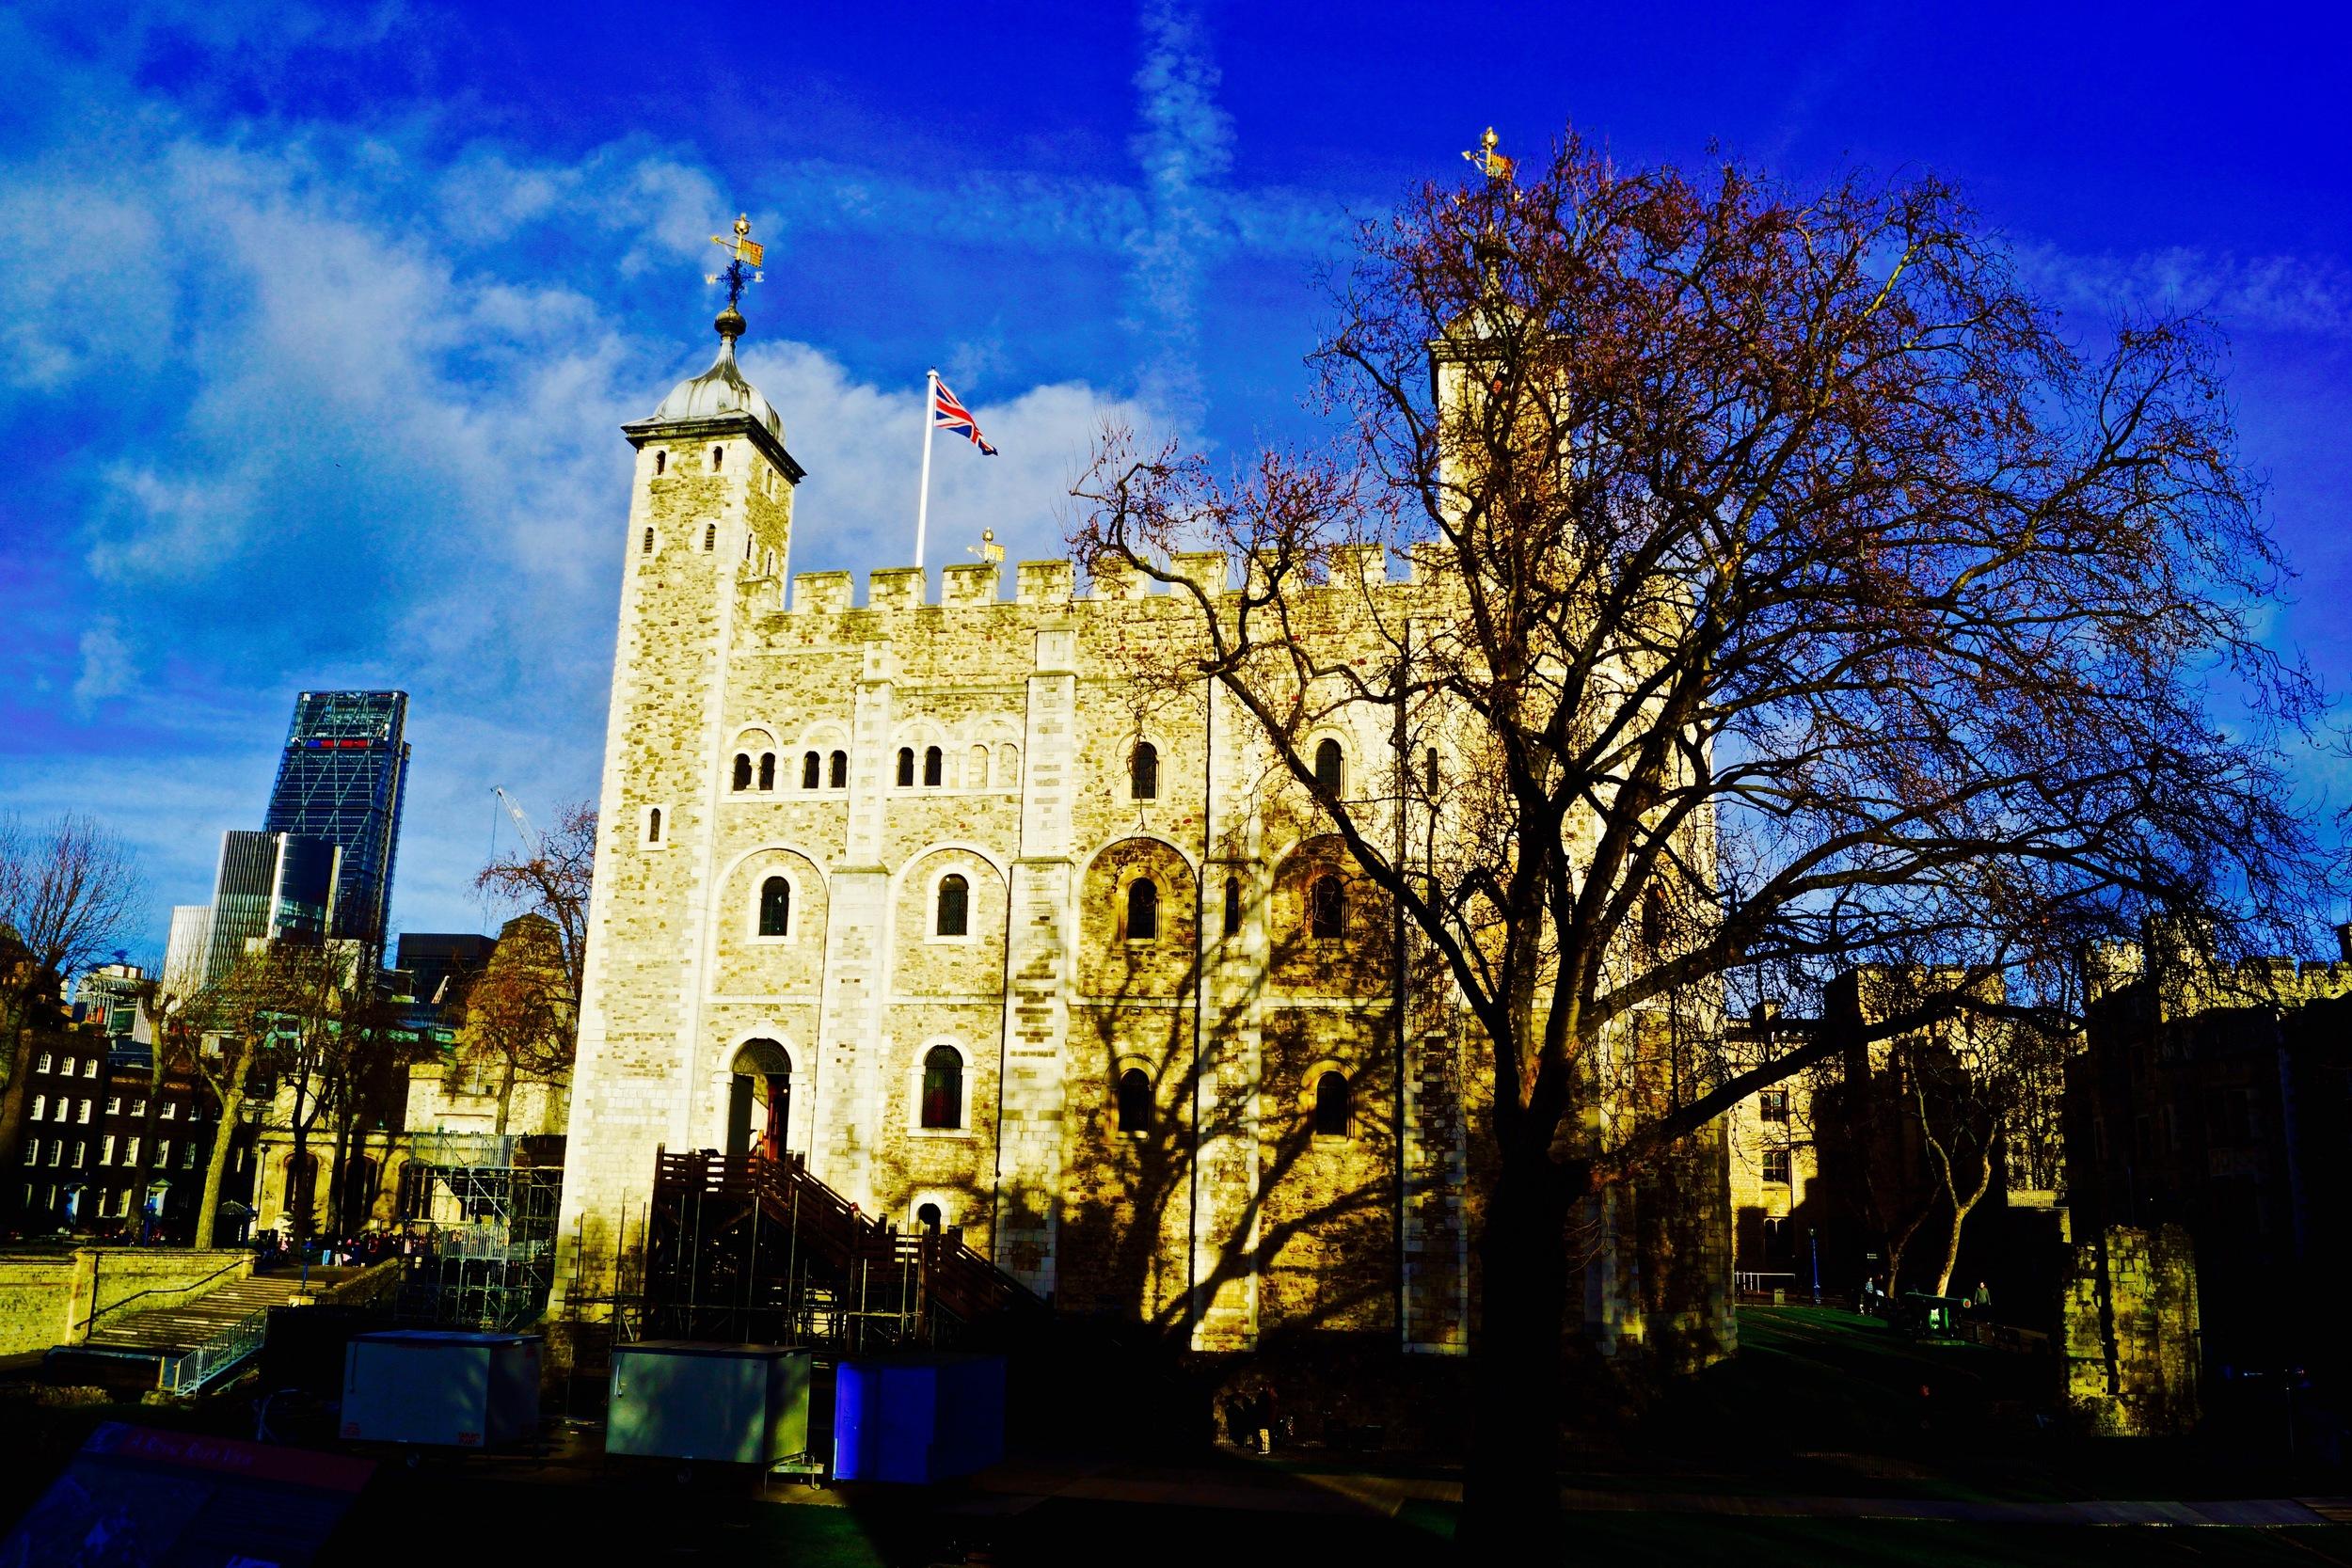 Tower of London, London, December 2014